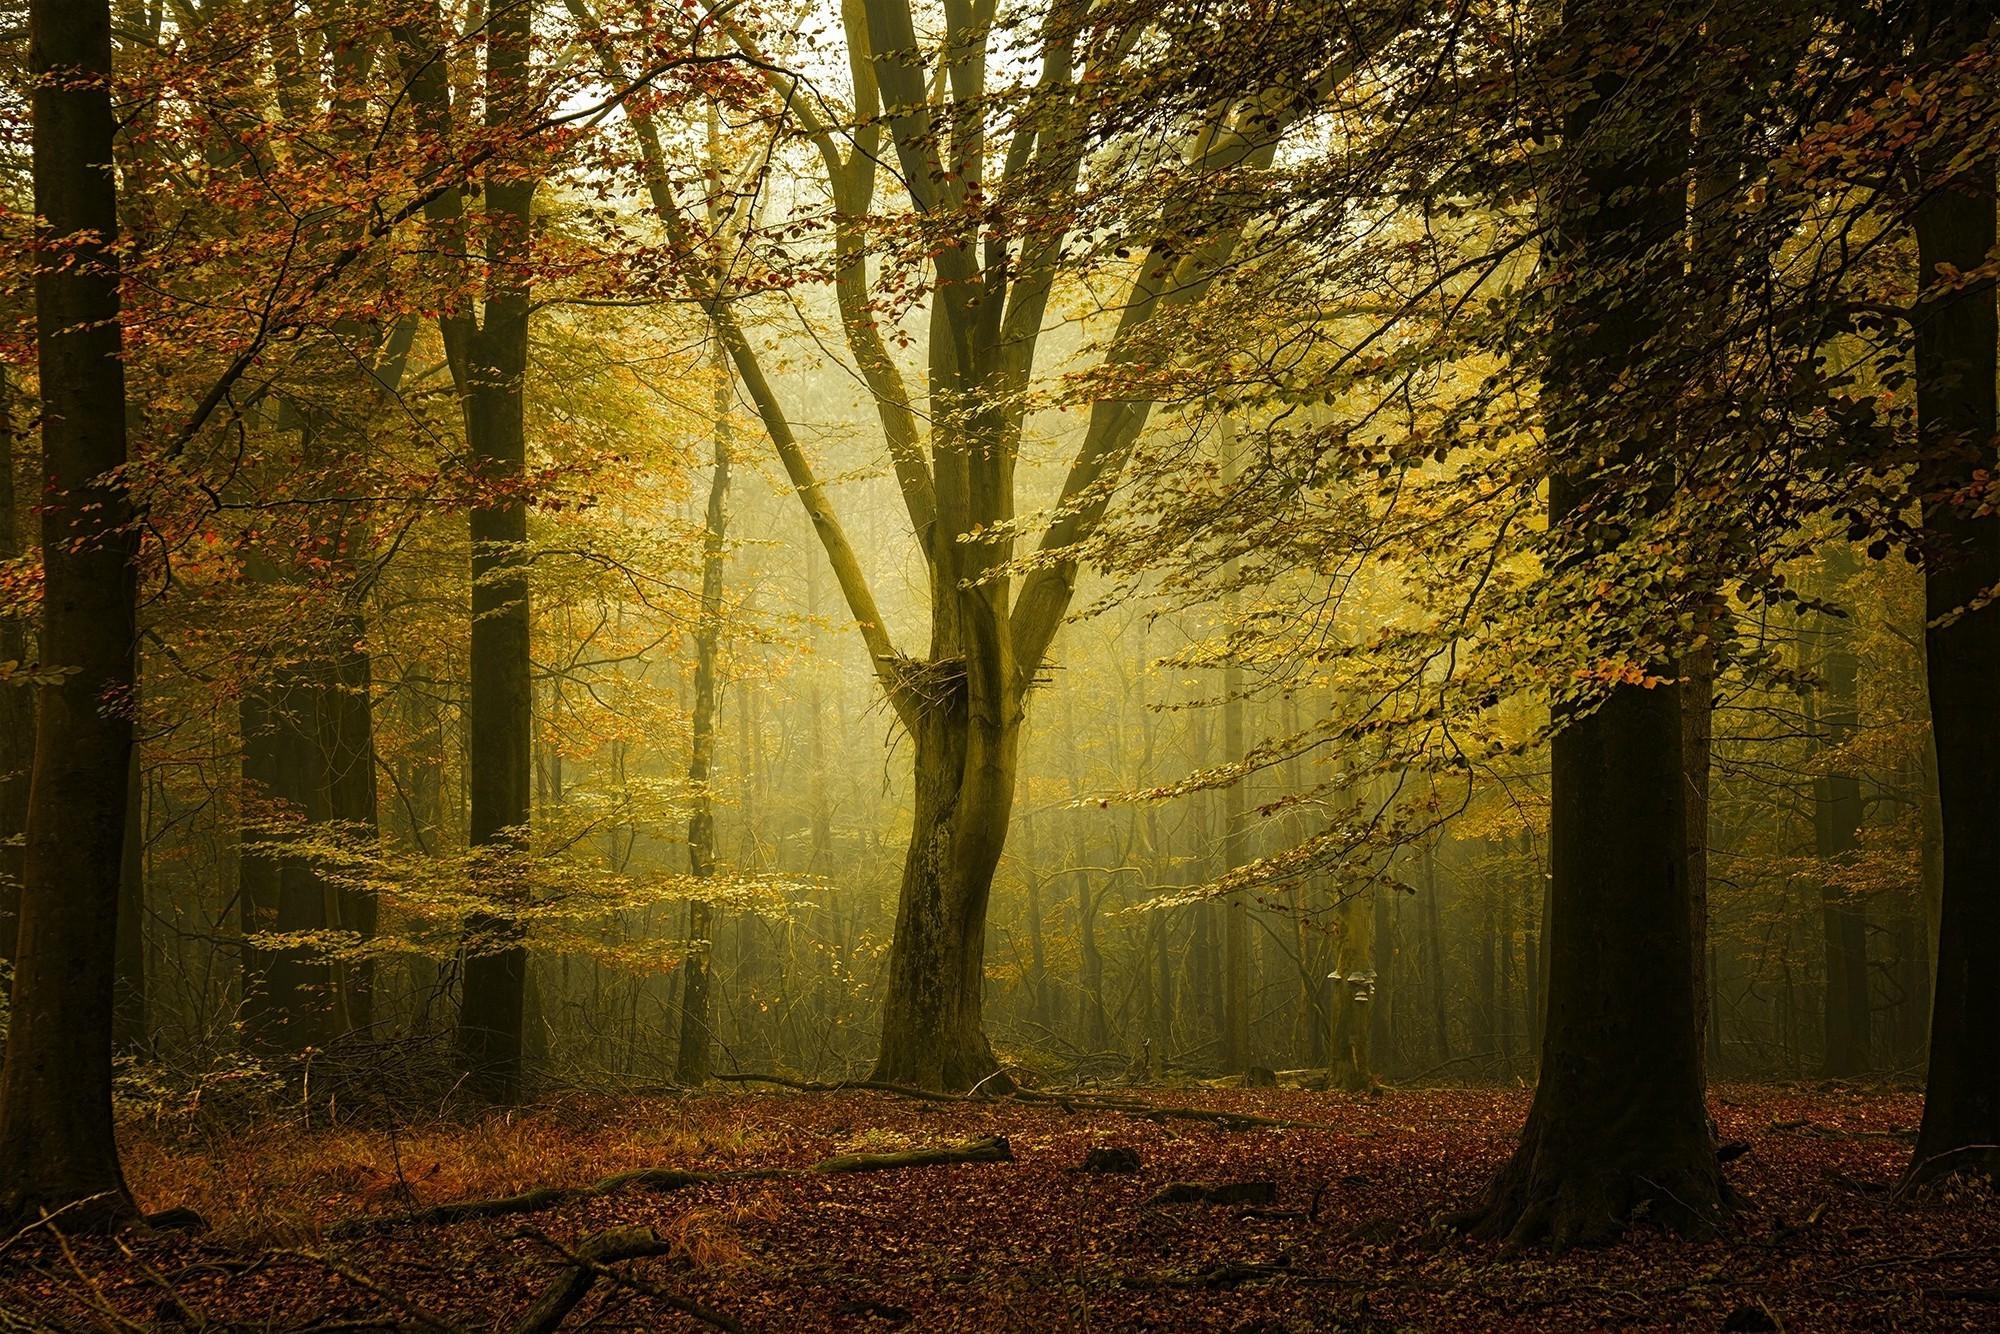 Fall Leaves Desktop Wallpaper Backgrounds Landscape Nature Fall Forest Sunlight Mist Leaves